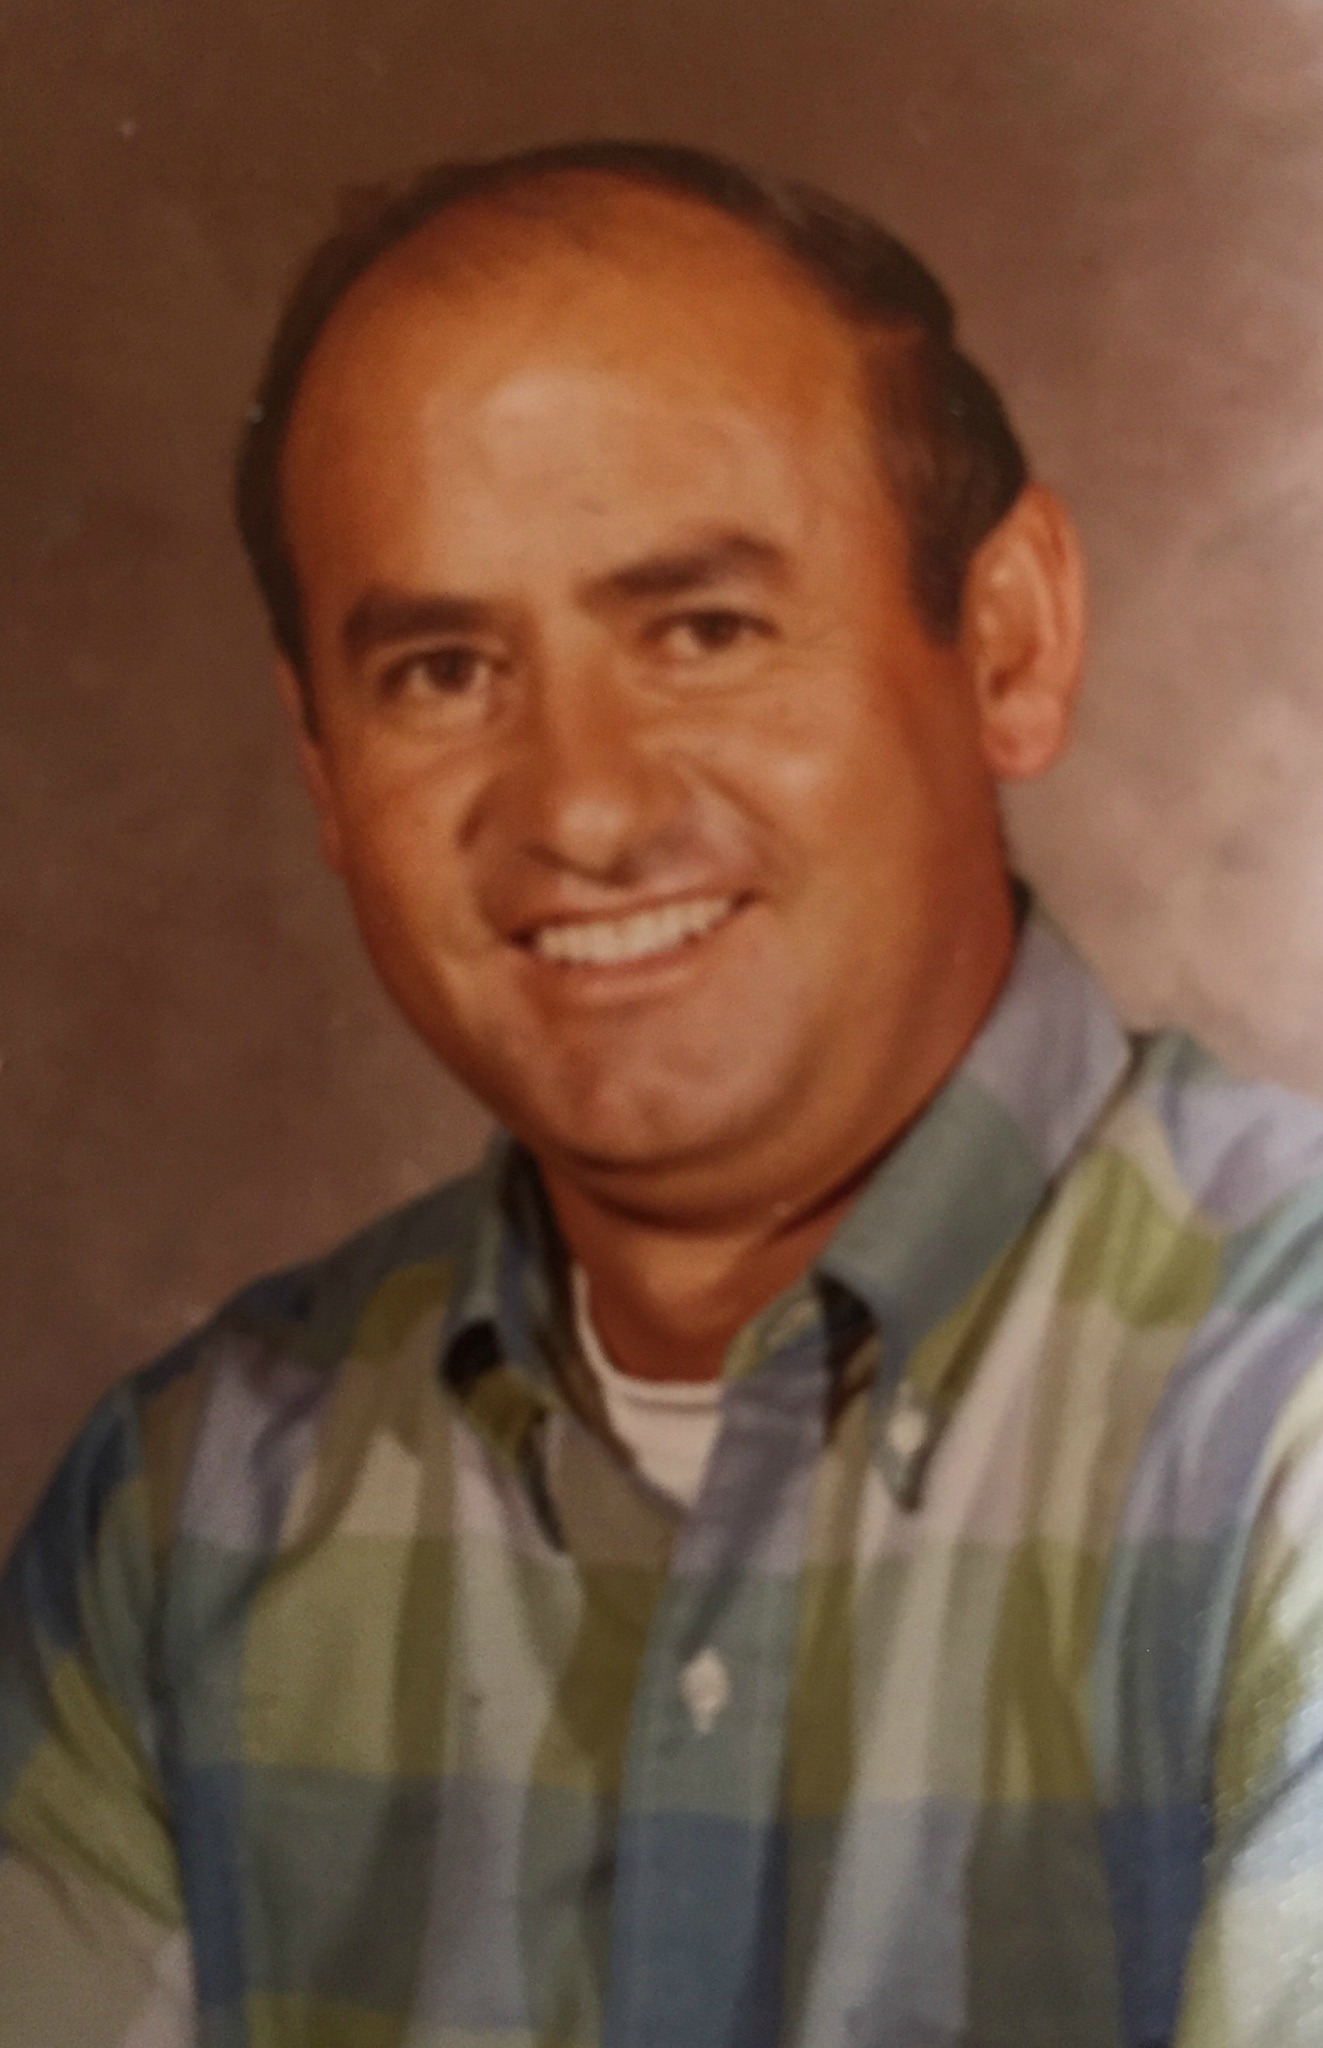 Joseph Fernandez